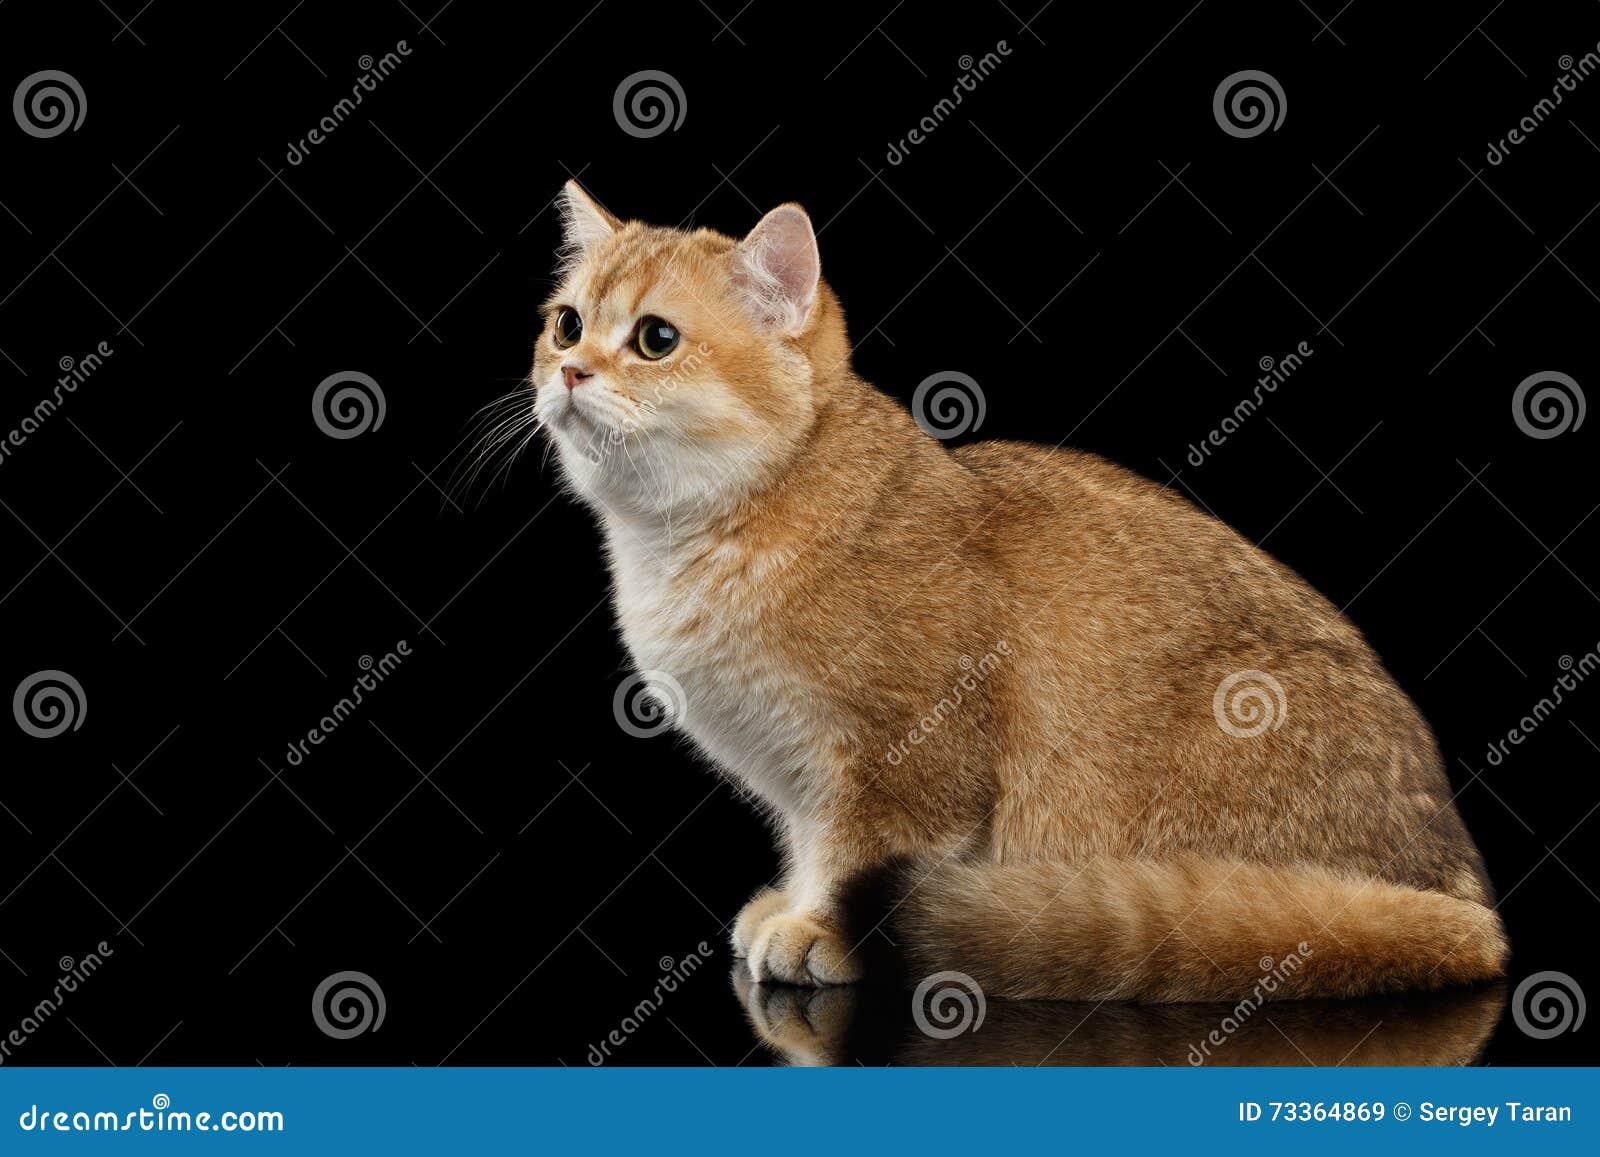 rachael ray wet cat food